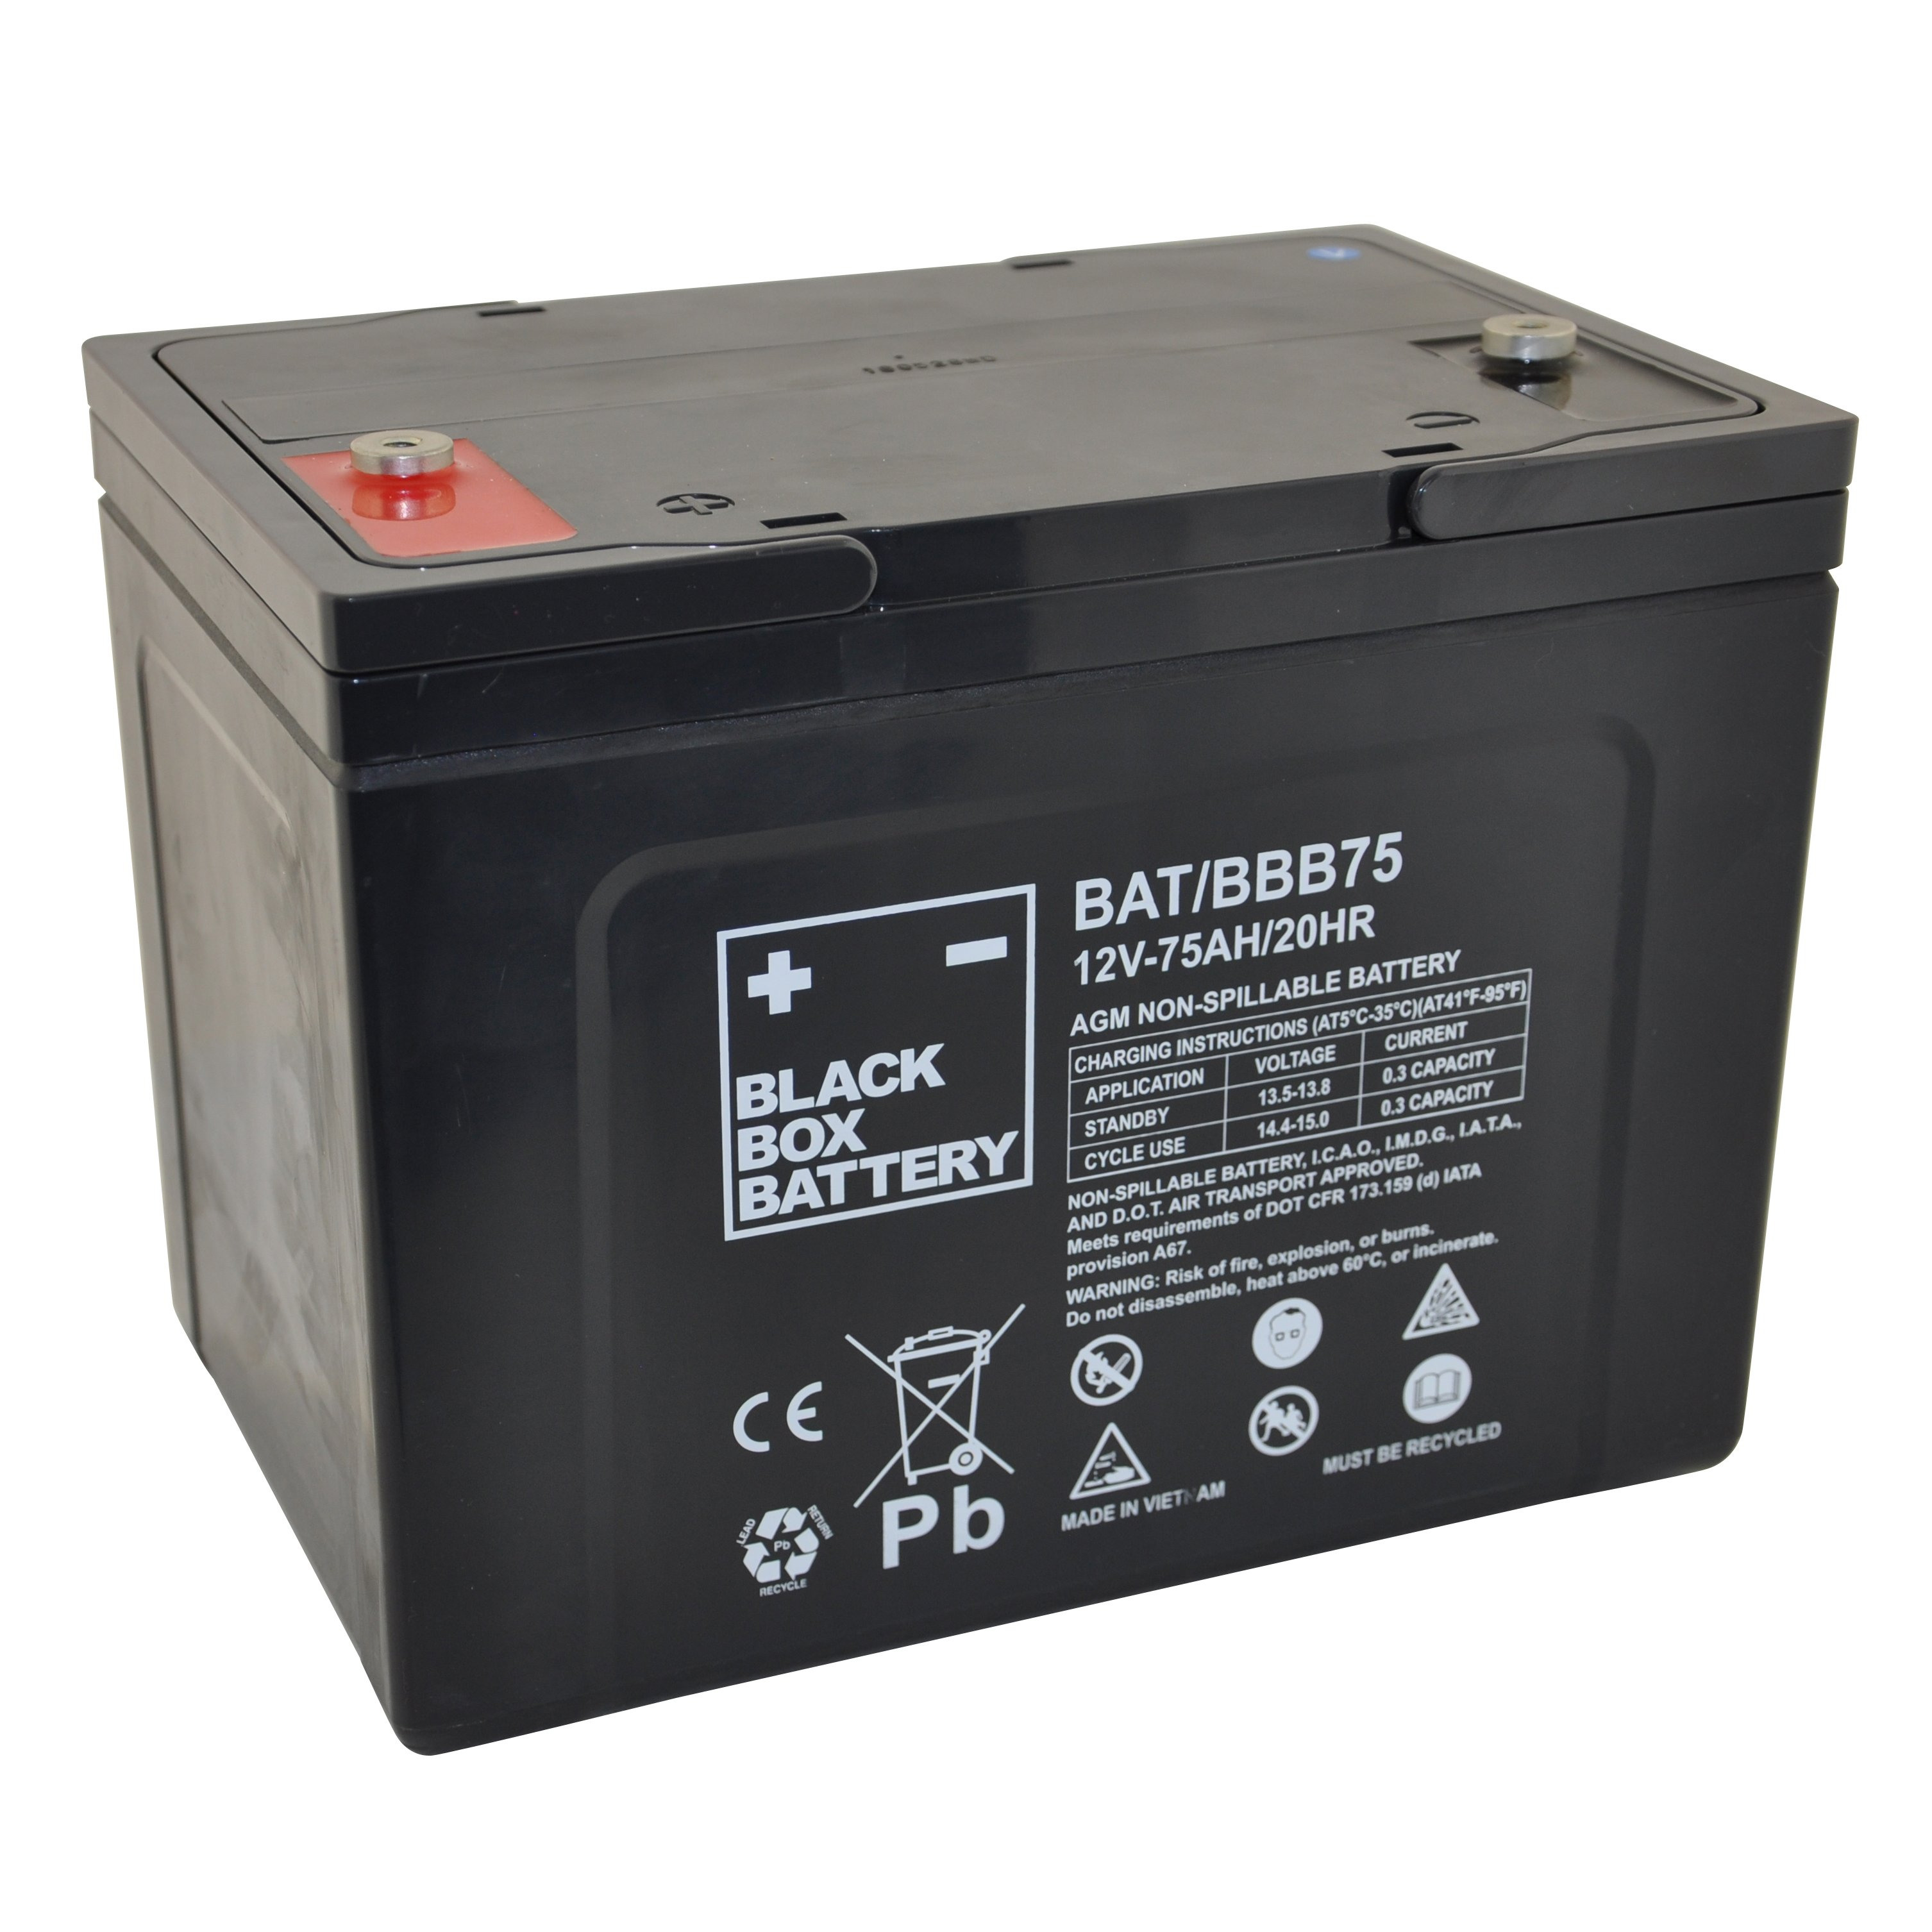 12v 75ah bbb battery and charger package lead acid. Black Bedroom Furniture Sets. Home Design Ideas